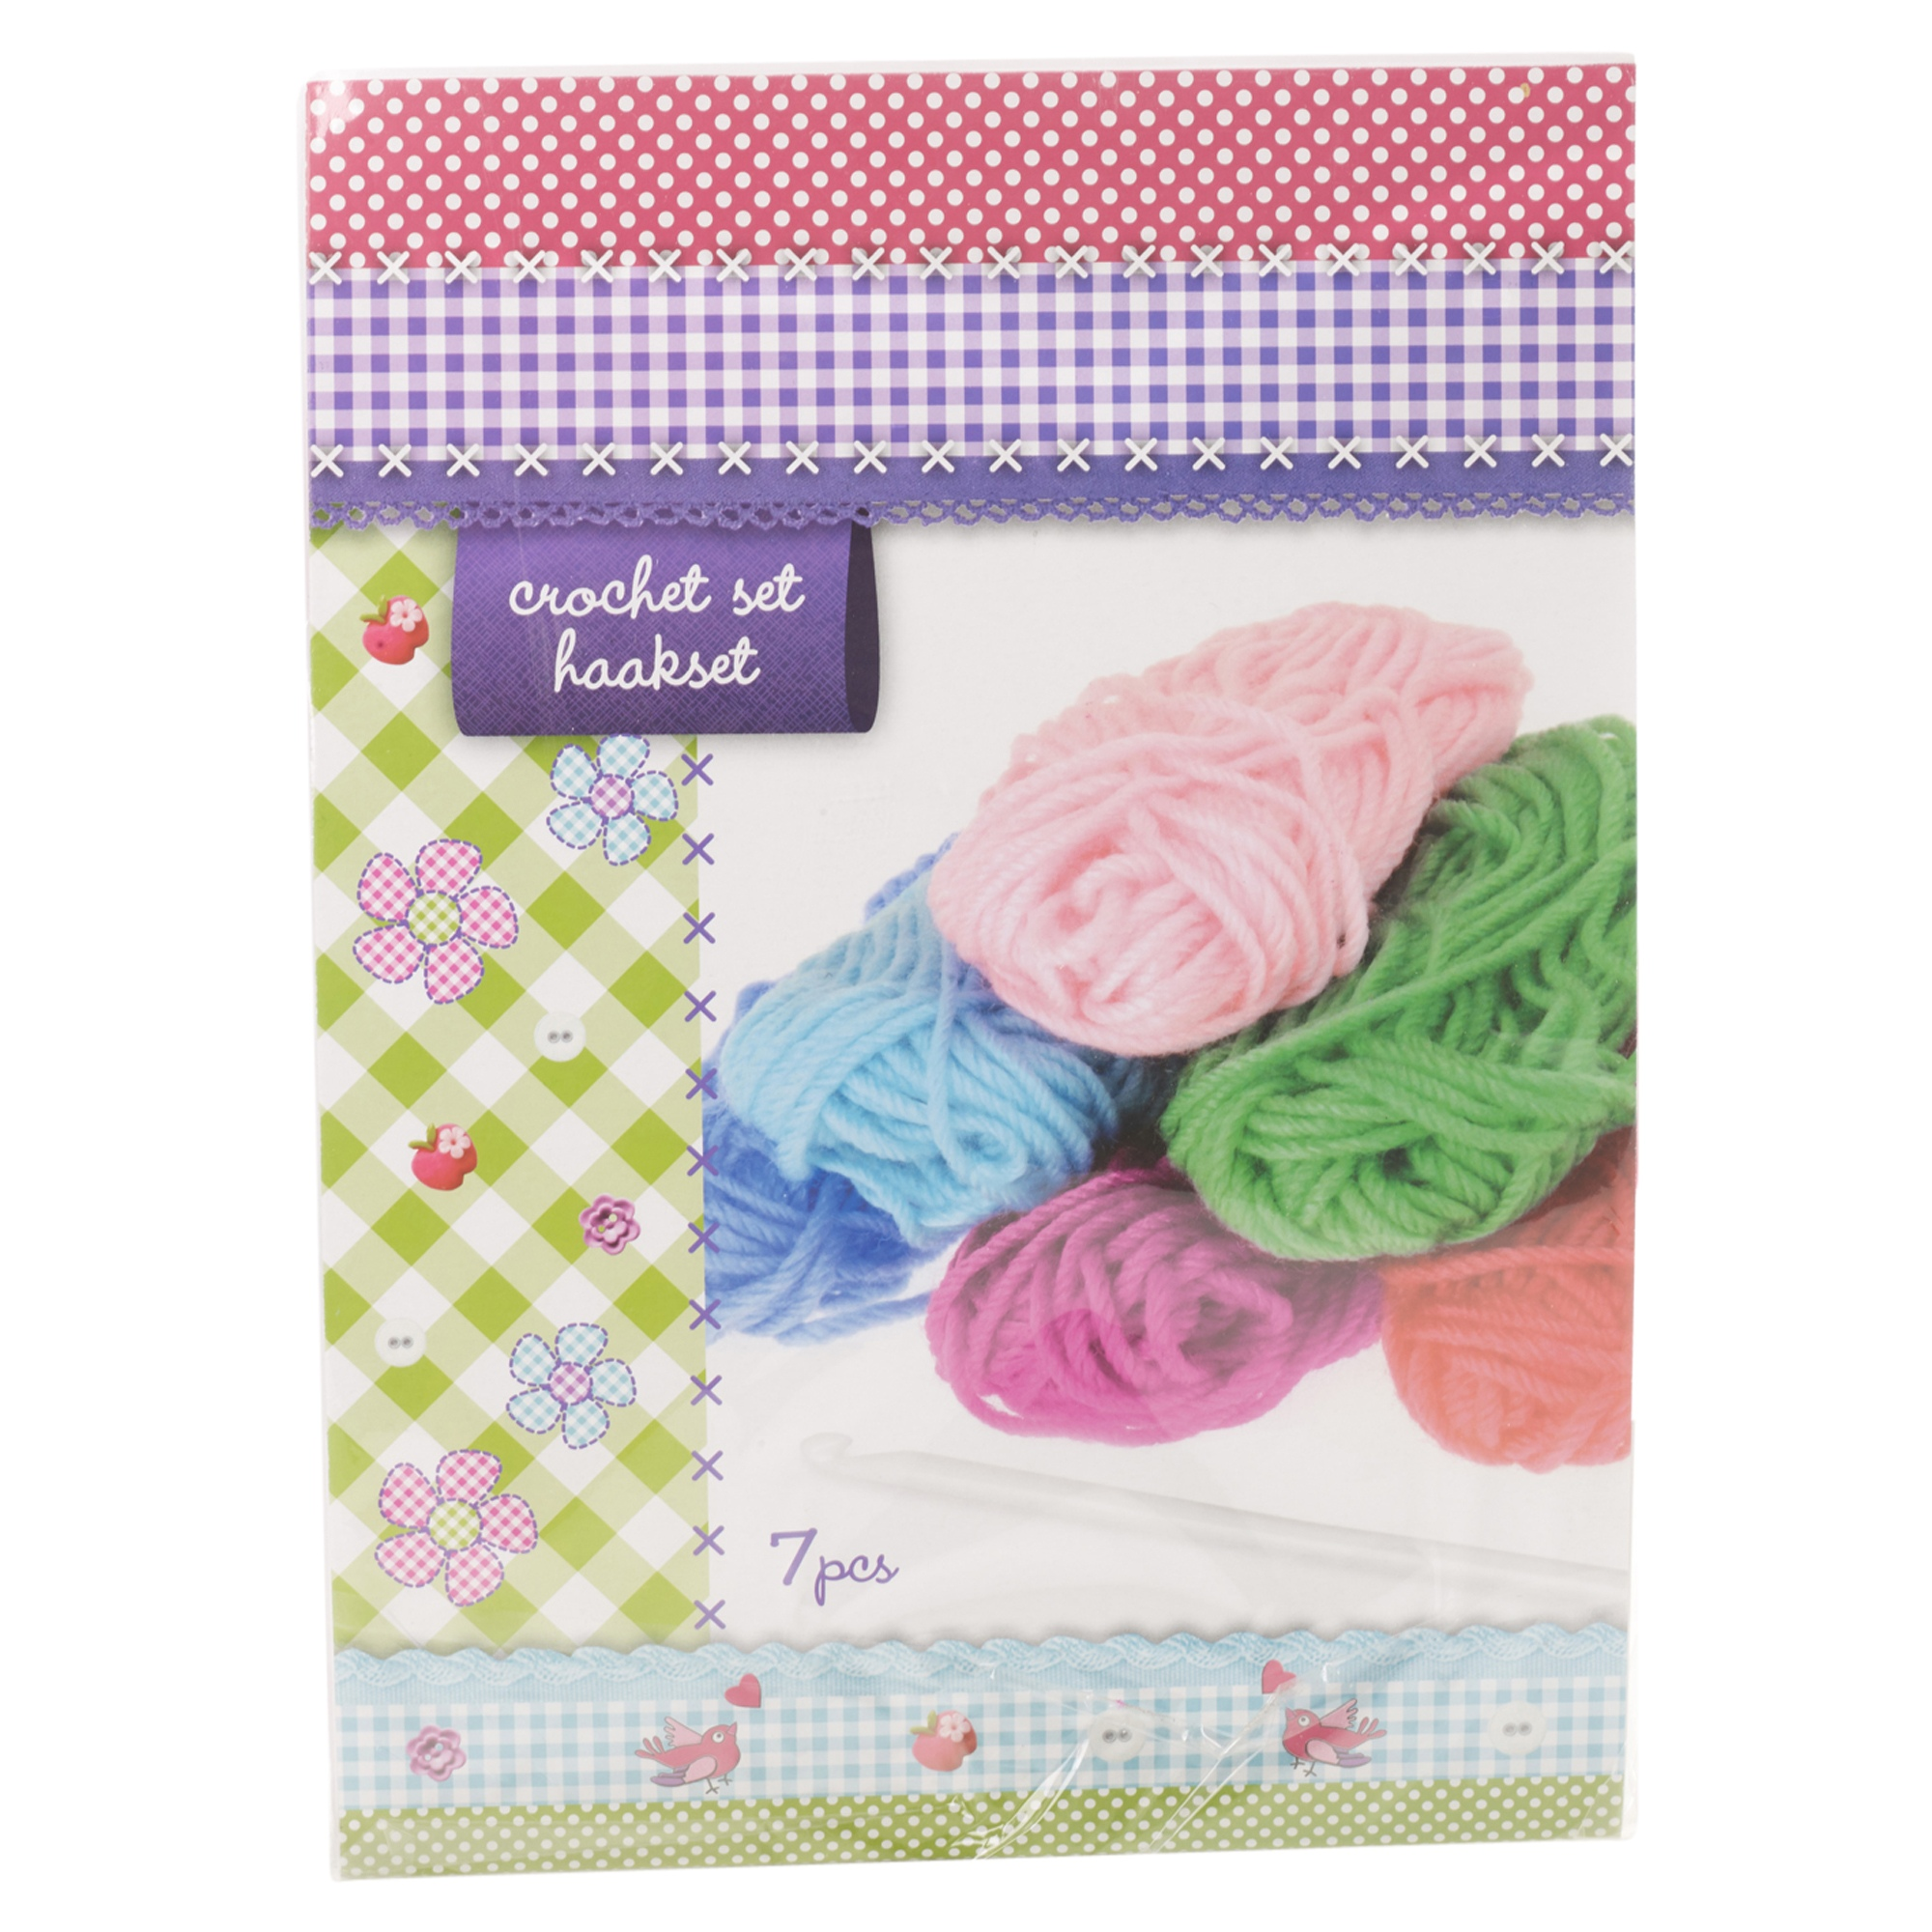 Loom Knitting Kits Uk : Knitting wool set oblong round craft kit sock scarf hat